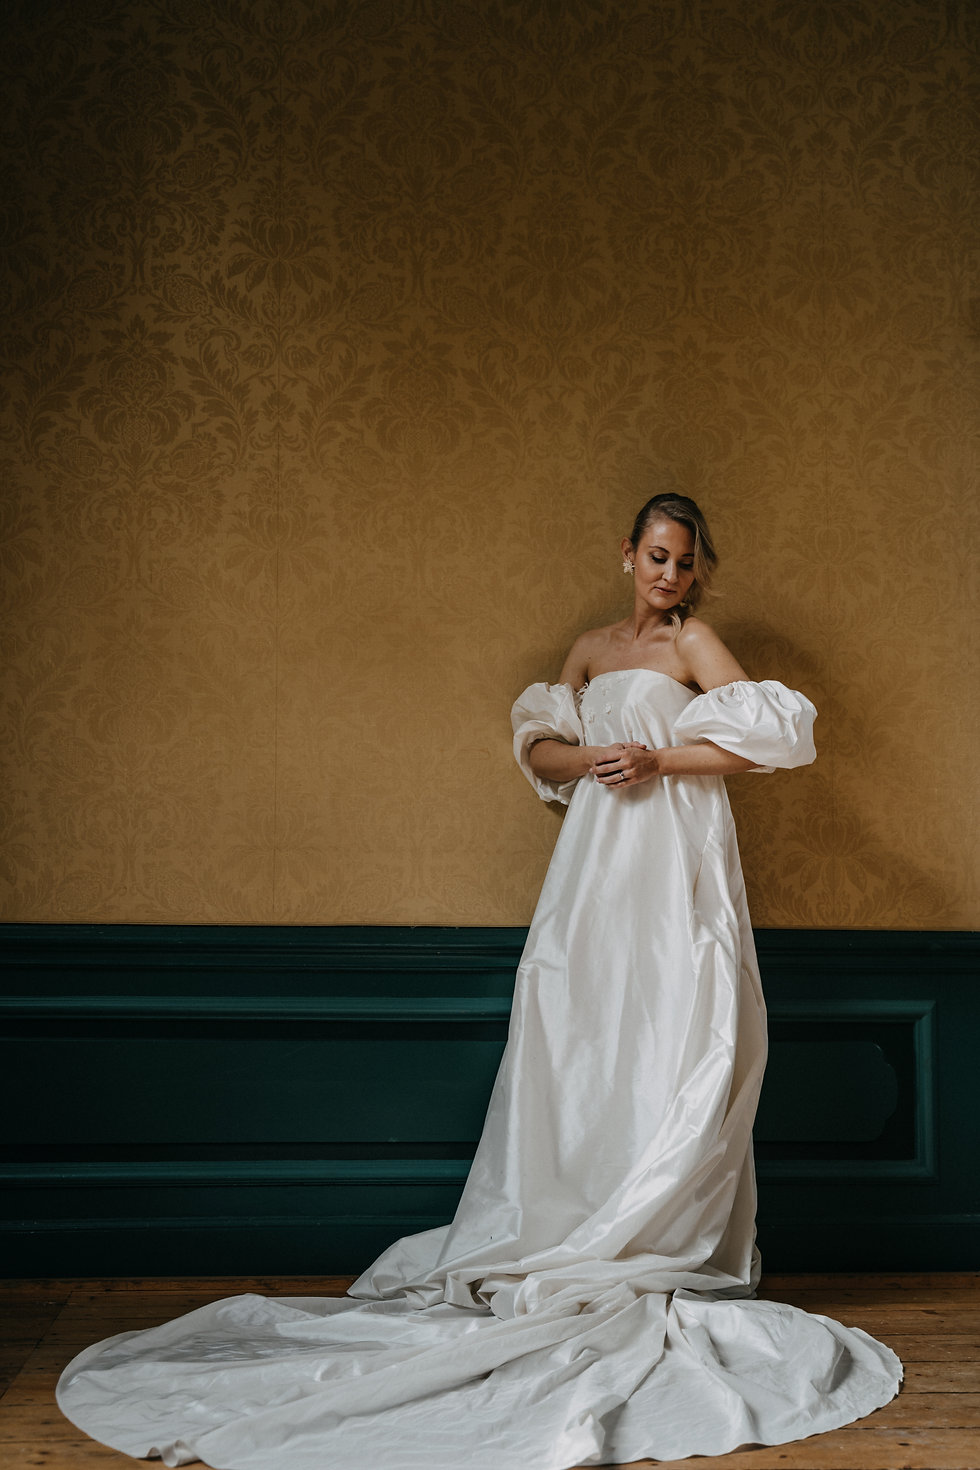 Destination Wedding fotograaf Zwolle - Yara Dragt Photography